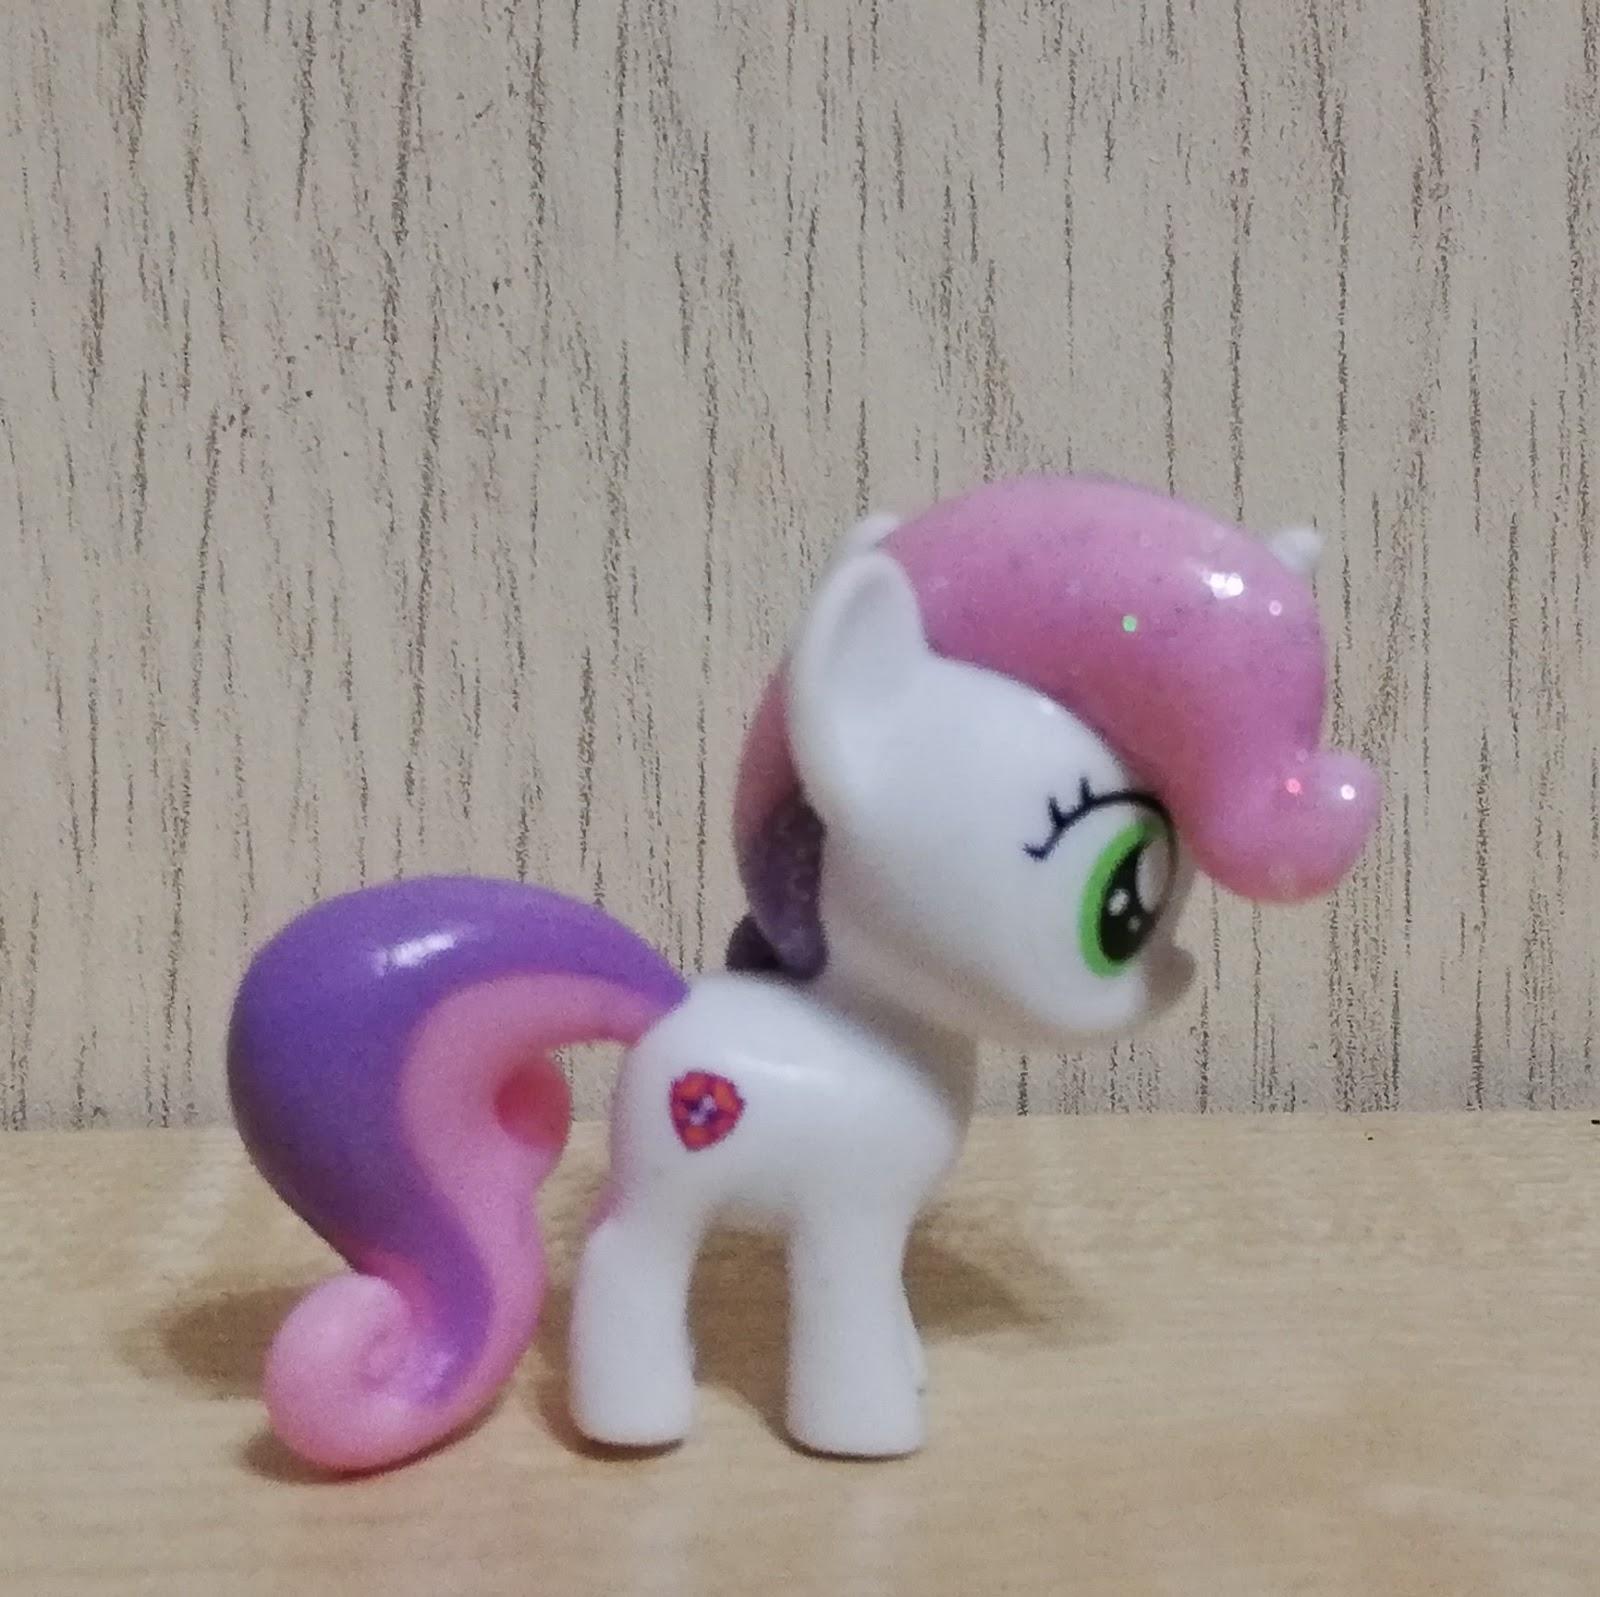 Sweetie Belle Figure New My Little Pony Egmont Figure